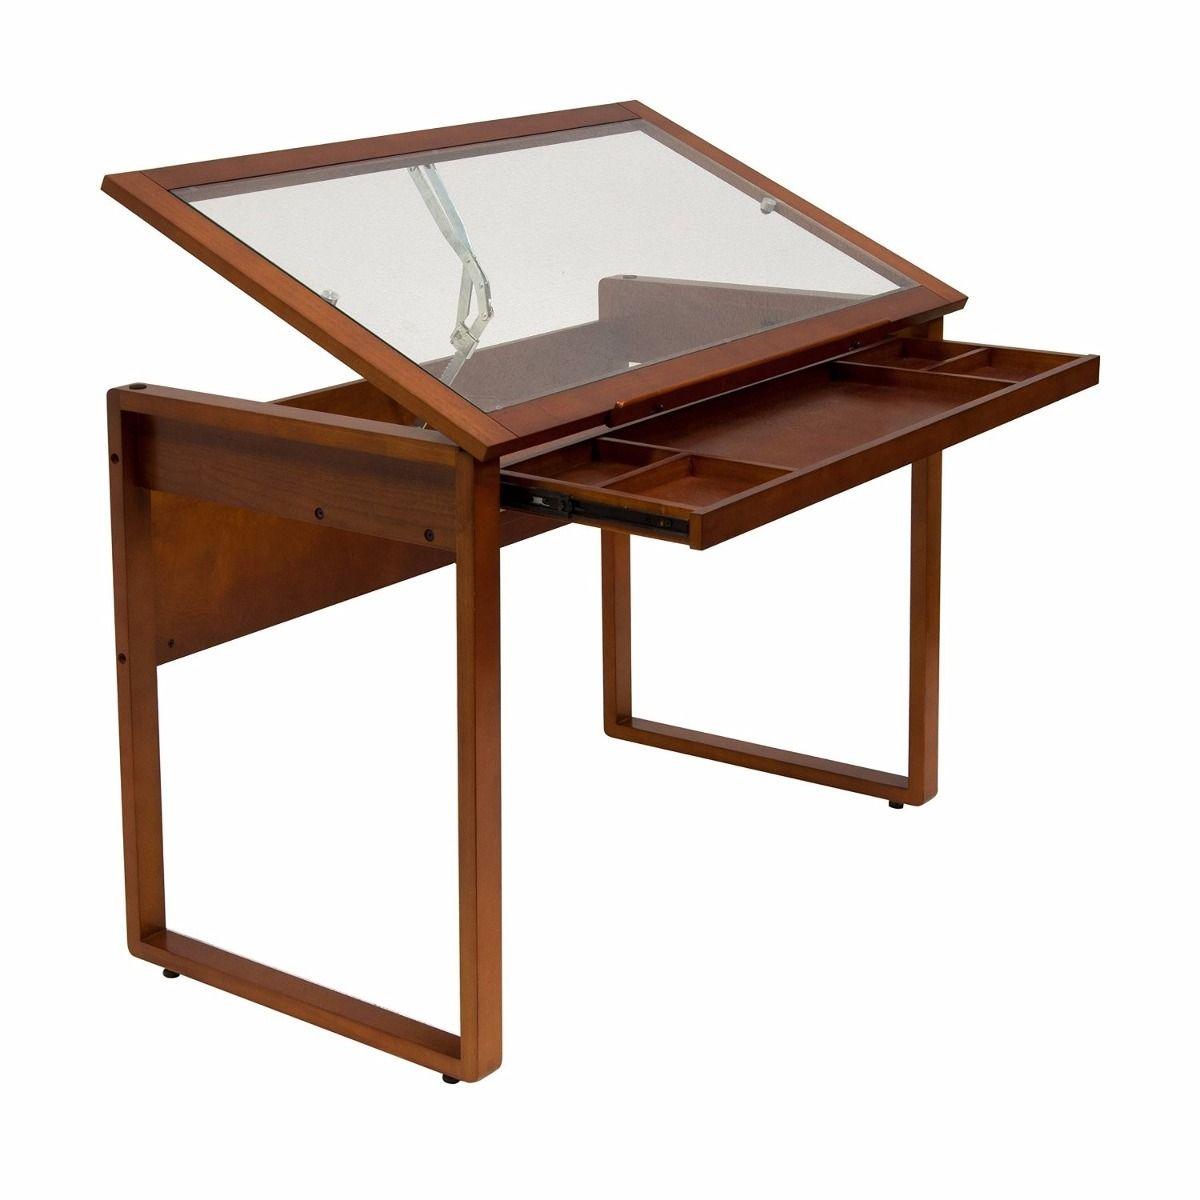 mesa dibujo restirador madera sonoma marrn y vidrio  Taller